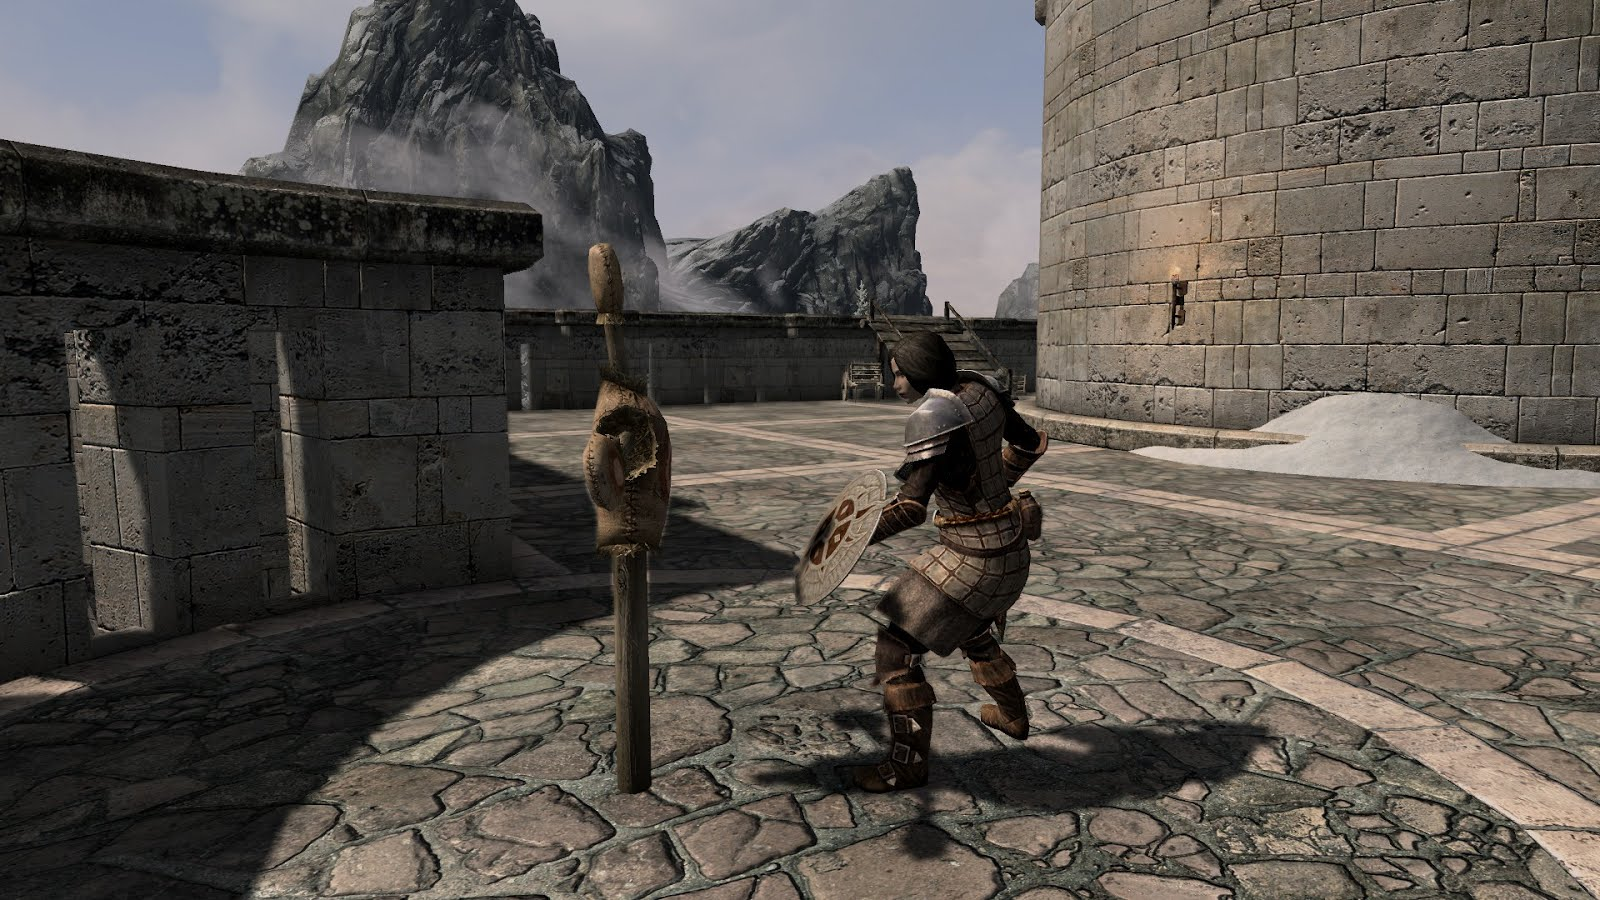 Martin James Mods: Skyrim - Fort Dawnguard Overhaul